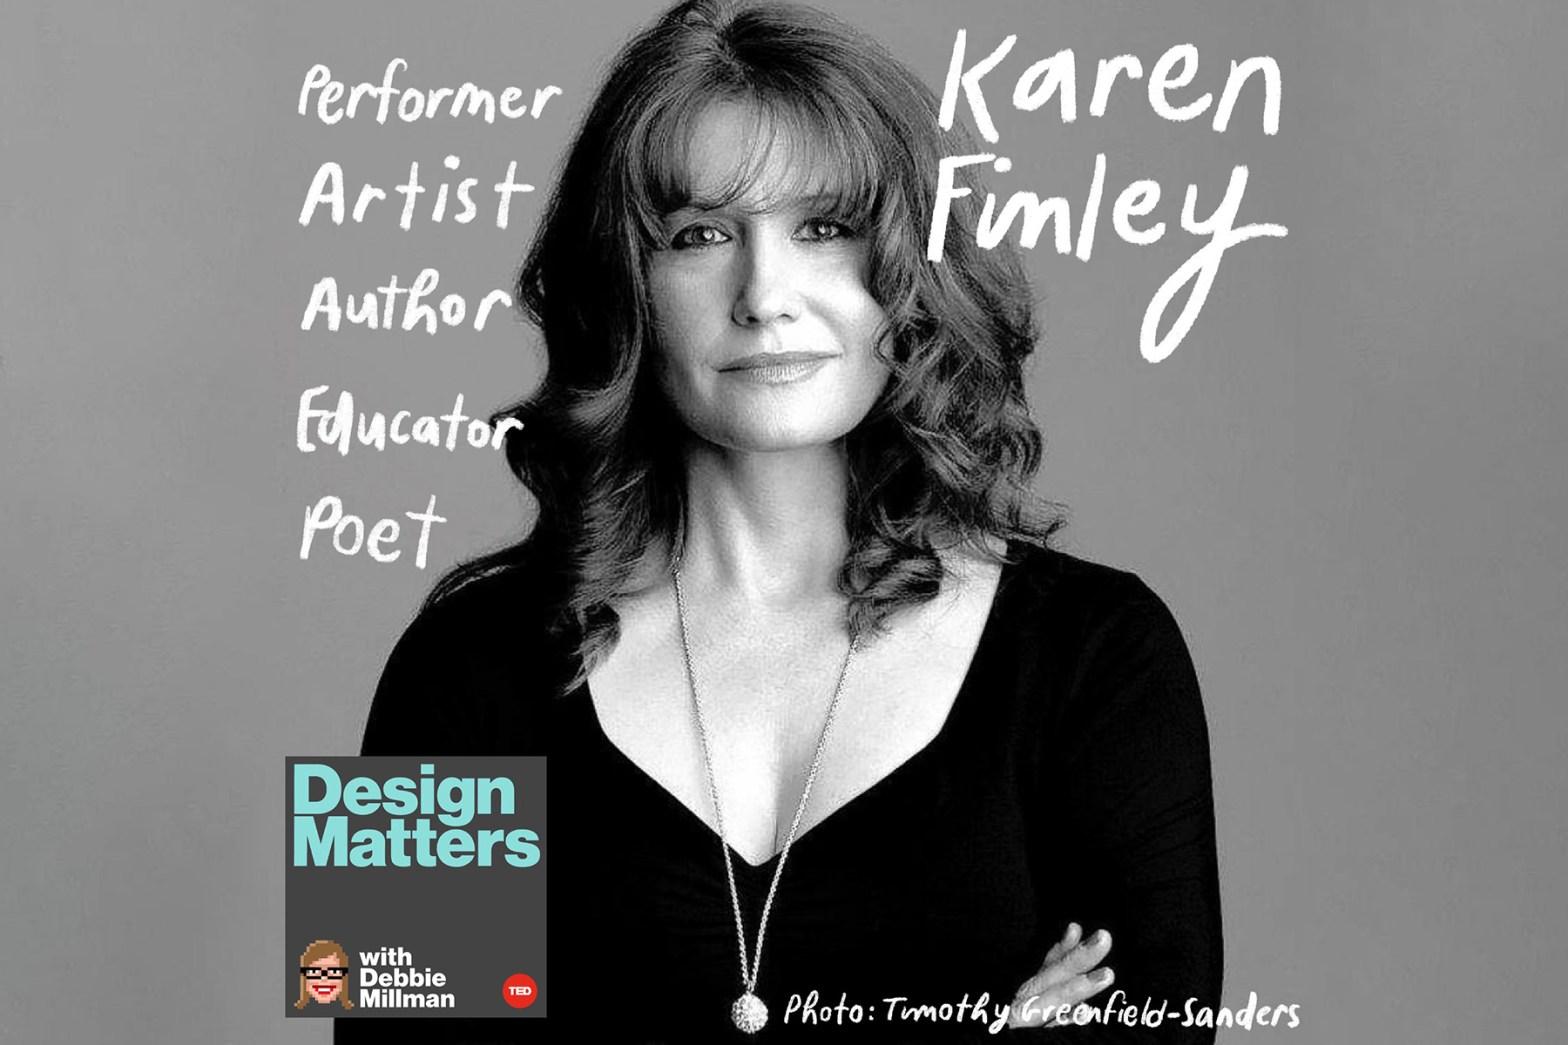 Thumbnail for Design Matters: Karen Finley